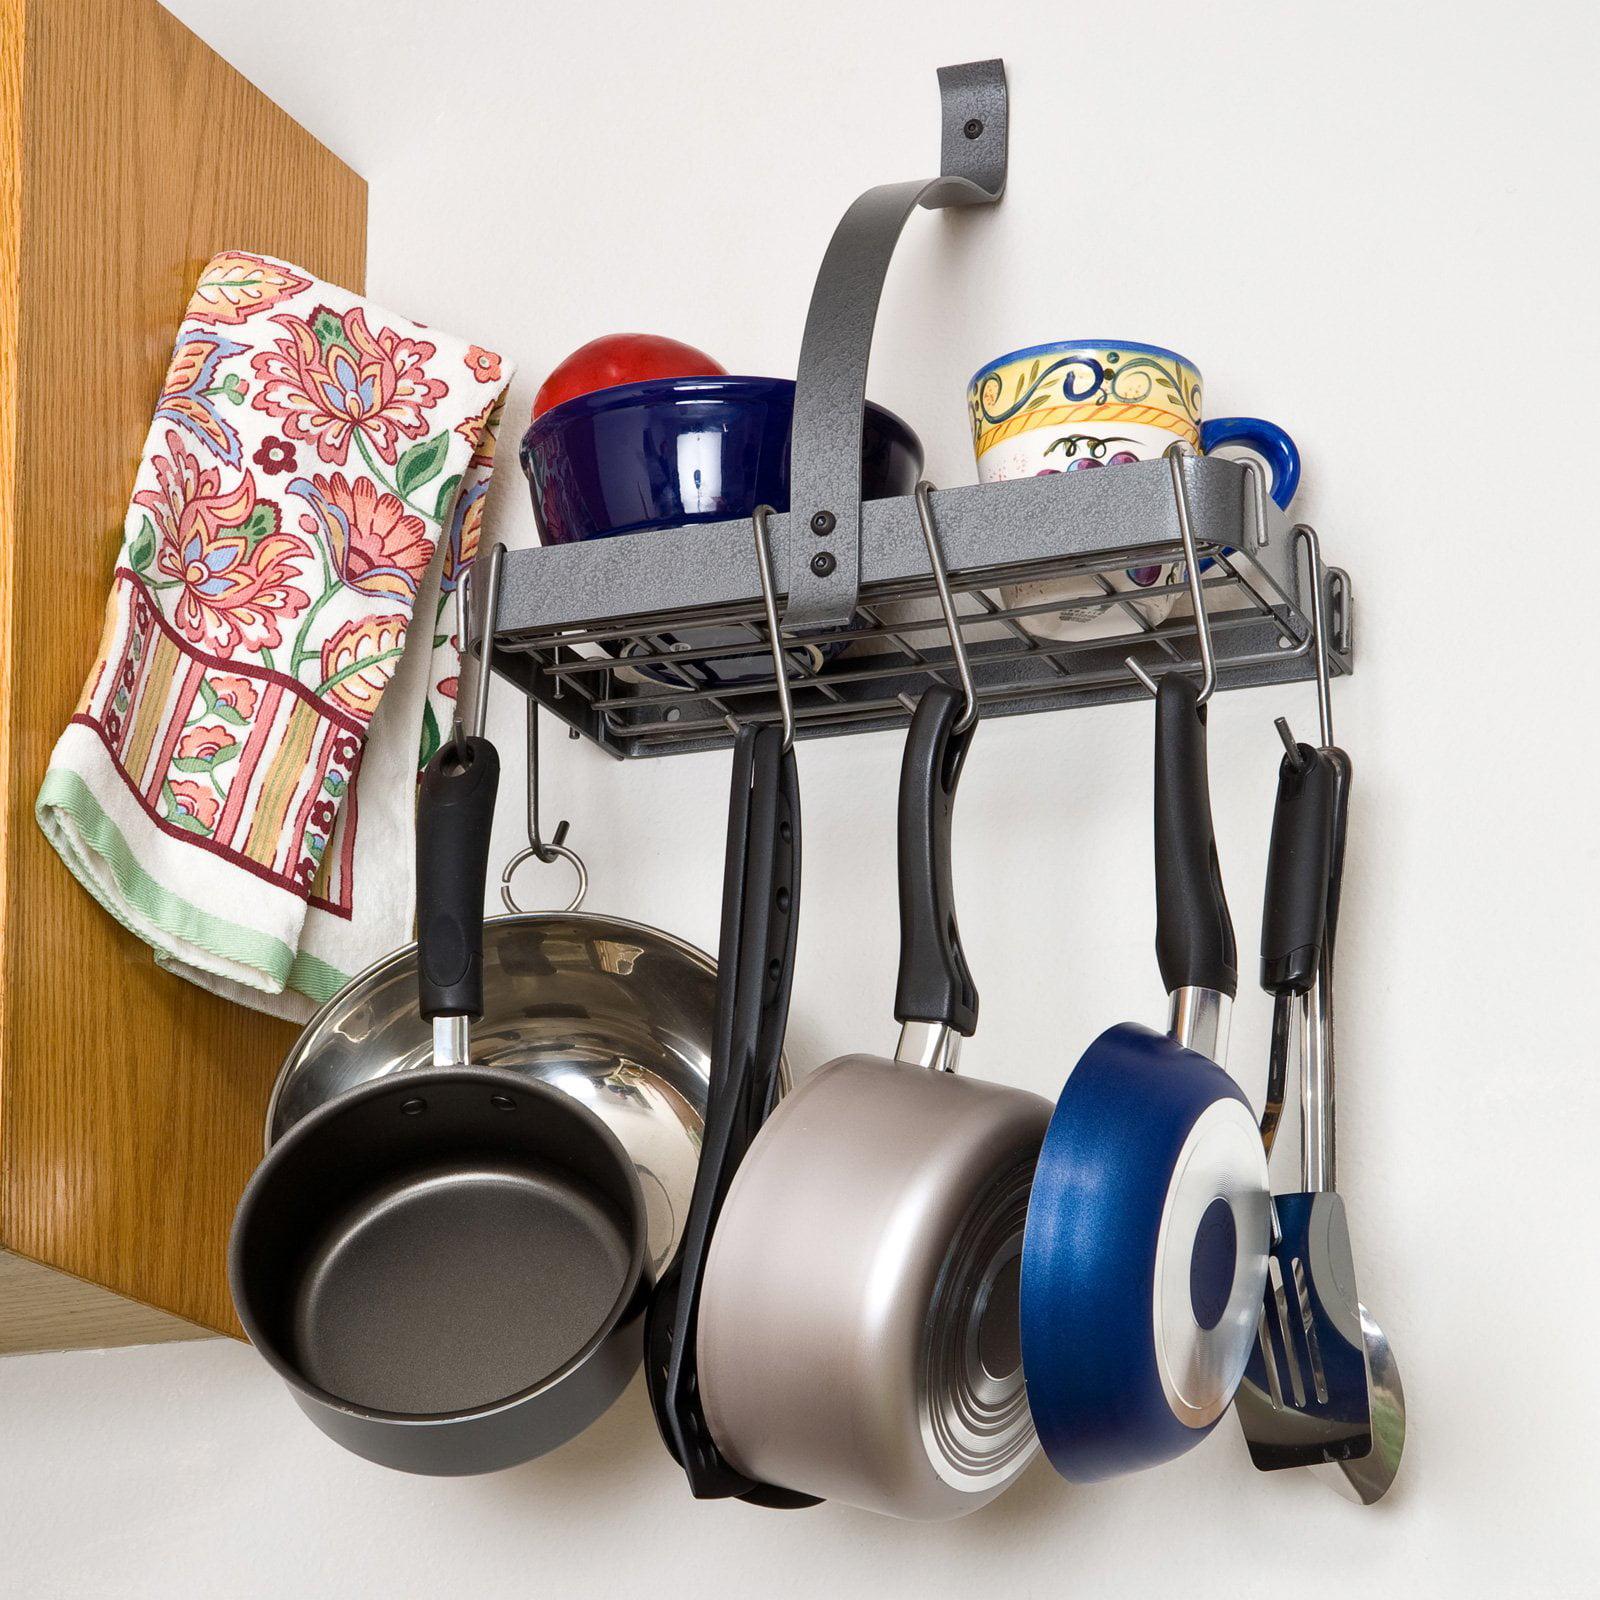 Rack It Up Accessory Shelf Pot Rack